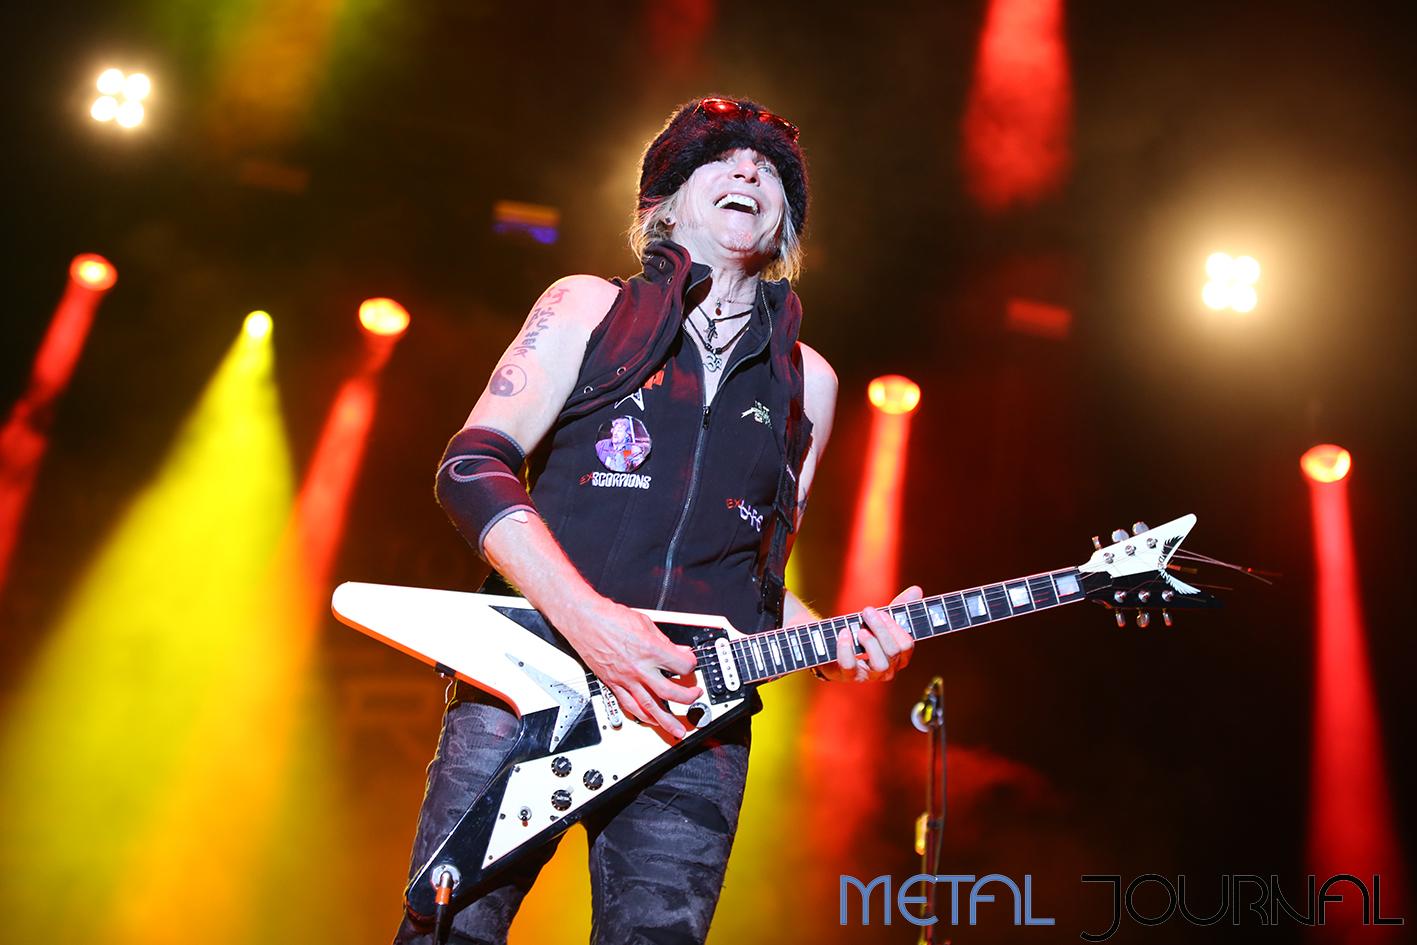 michael schenker fest - metal journal rock fest barcelona 2019 pic 3